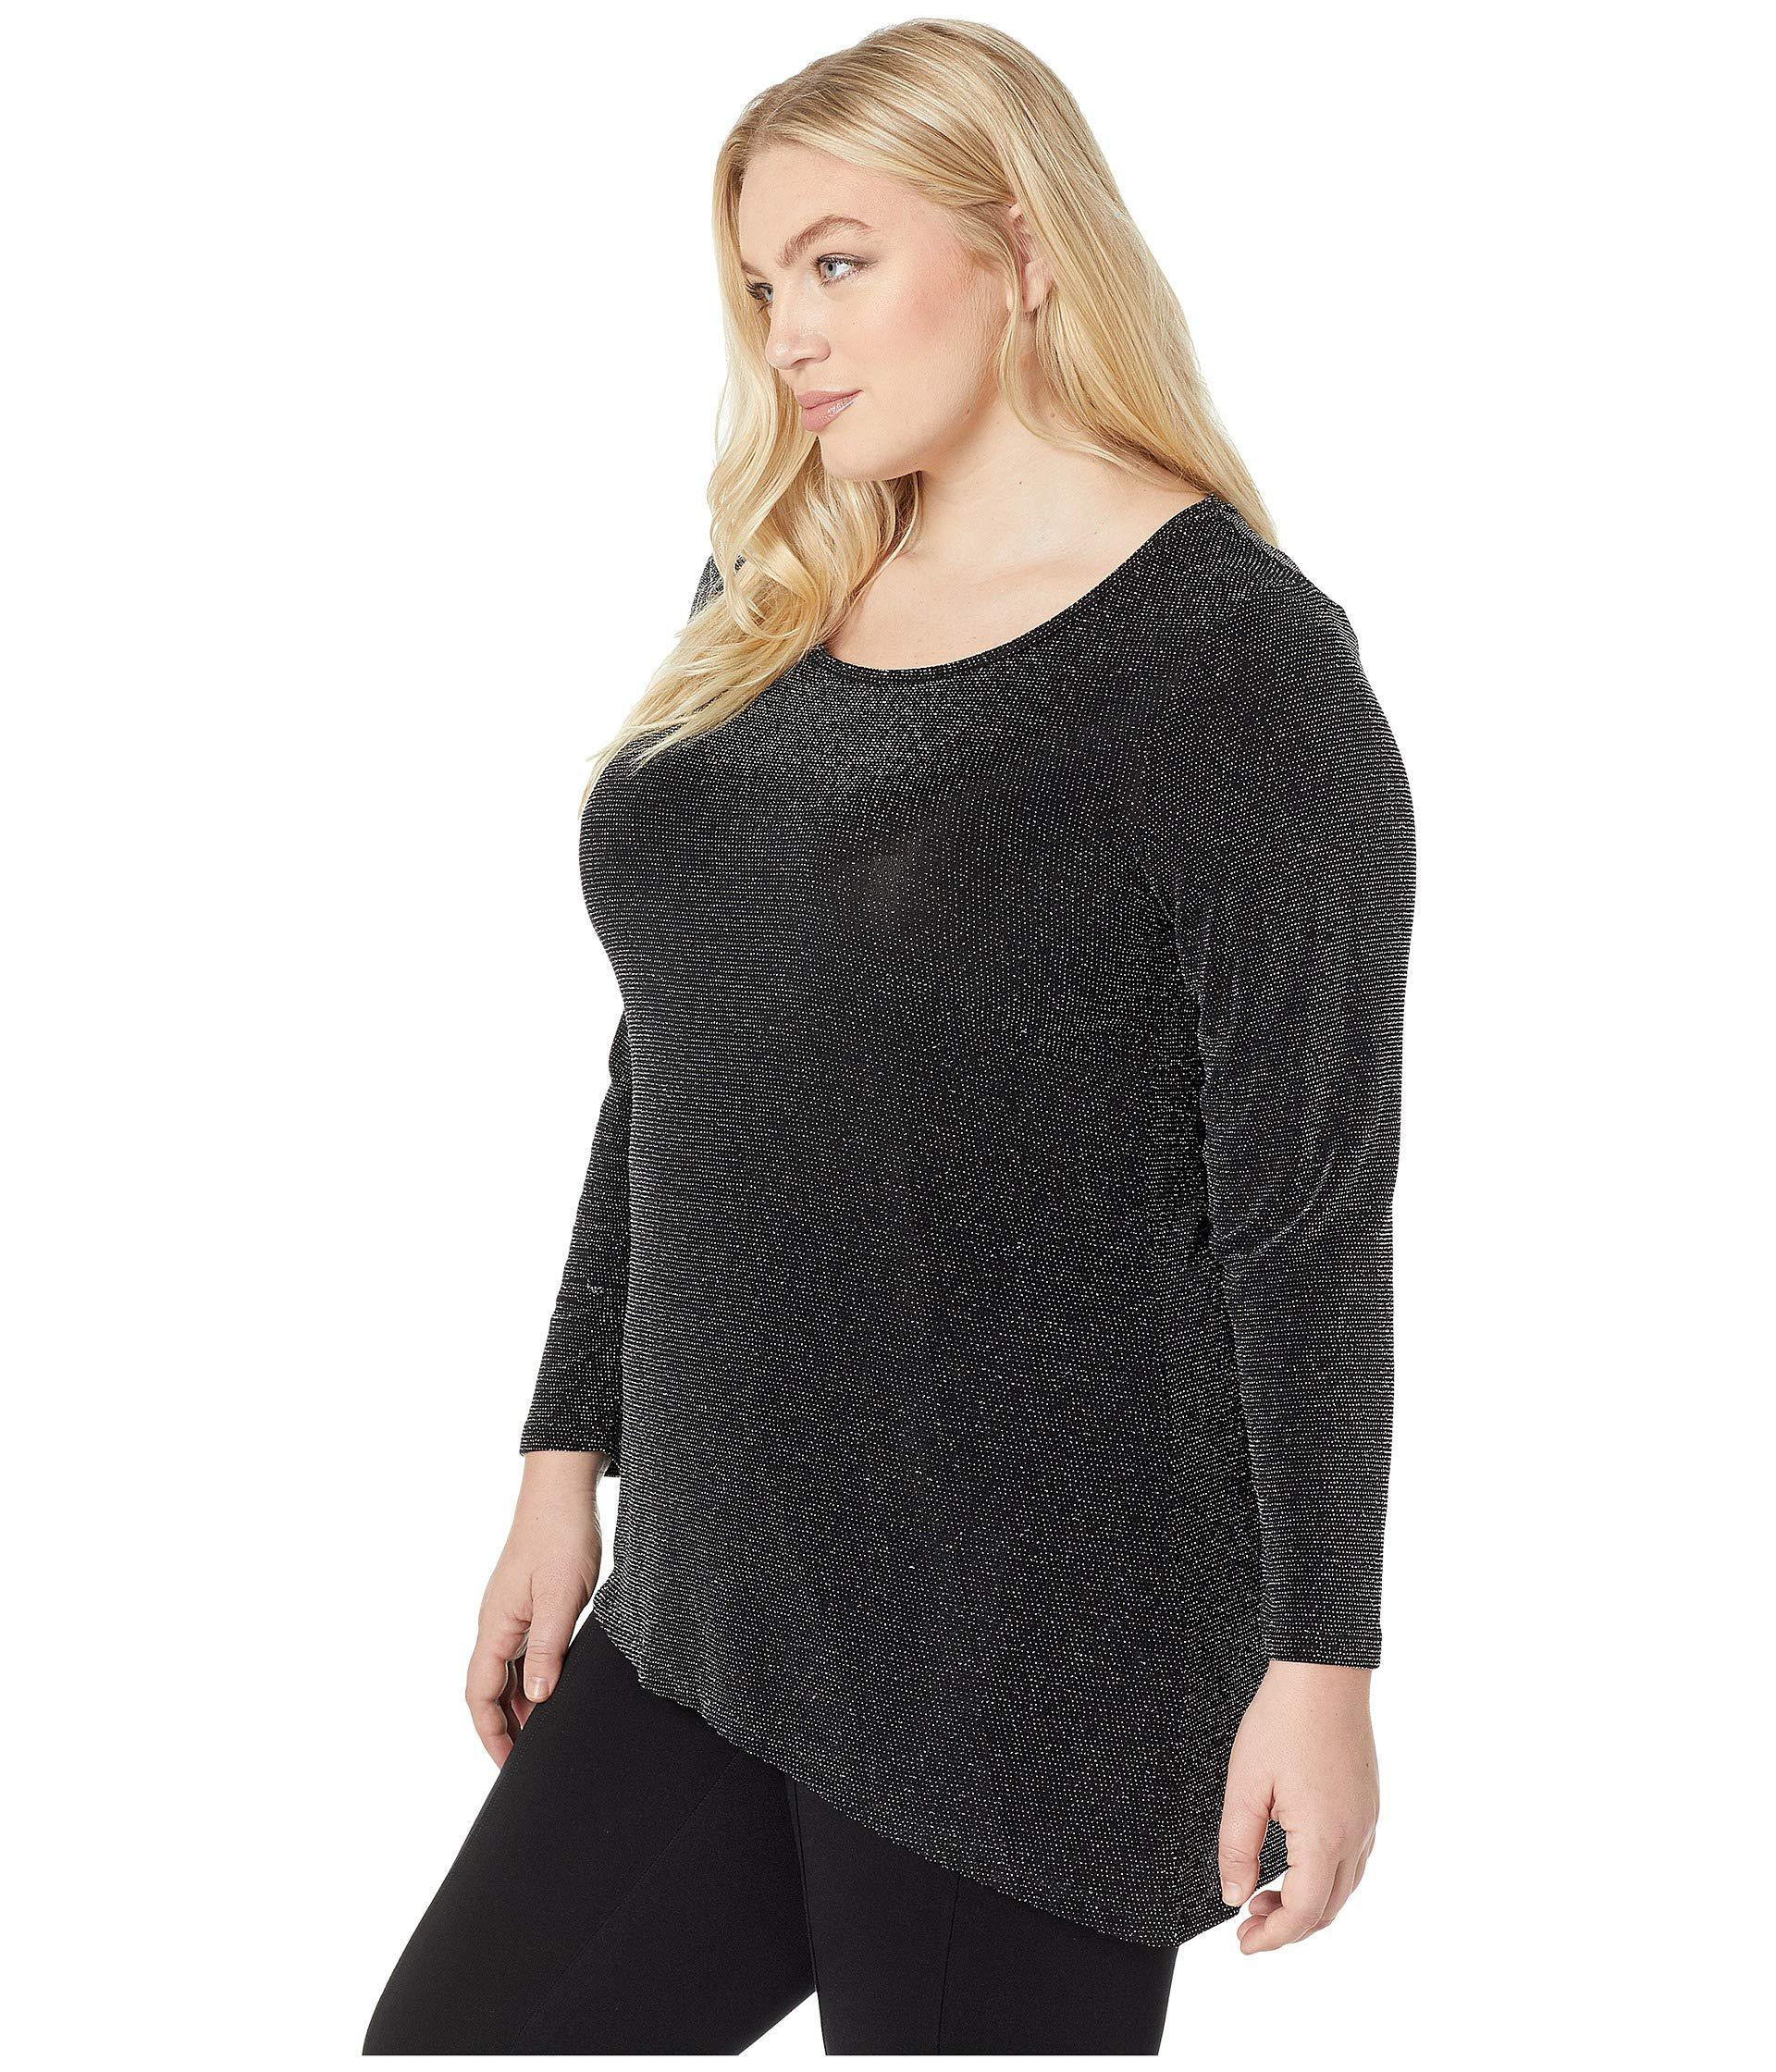 5279f92e890bd Lyst - Calvin Klein Plus Size Long Sleeve Asymmetric Metallic Top  (black silver) Women s Clothing in Black